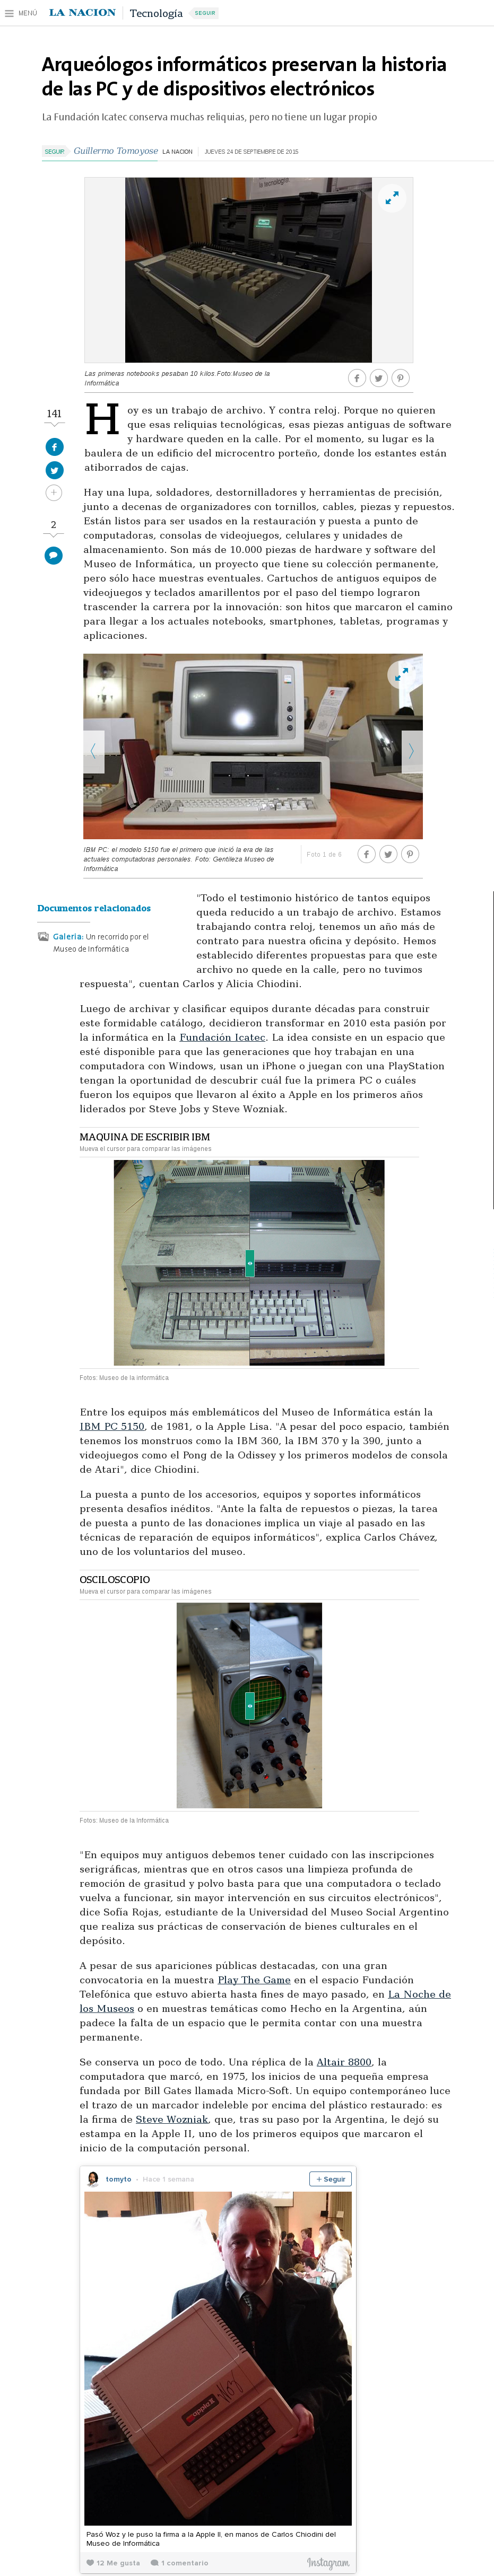 nota-lanacion-24-09-2015